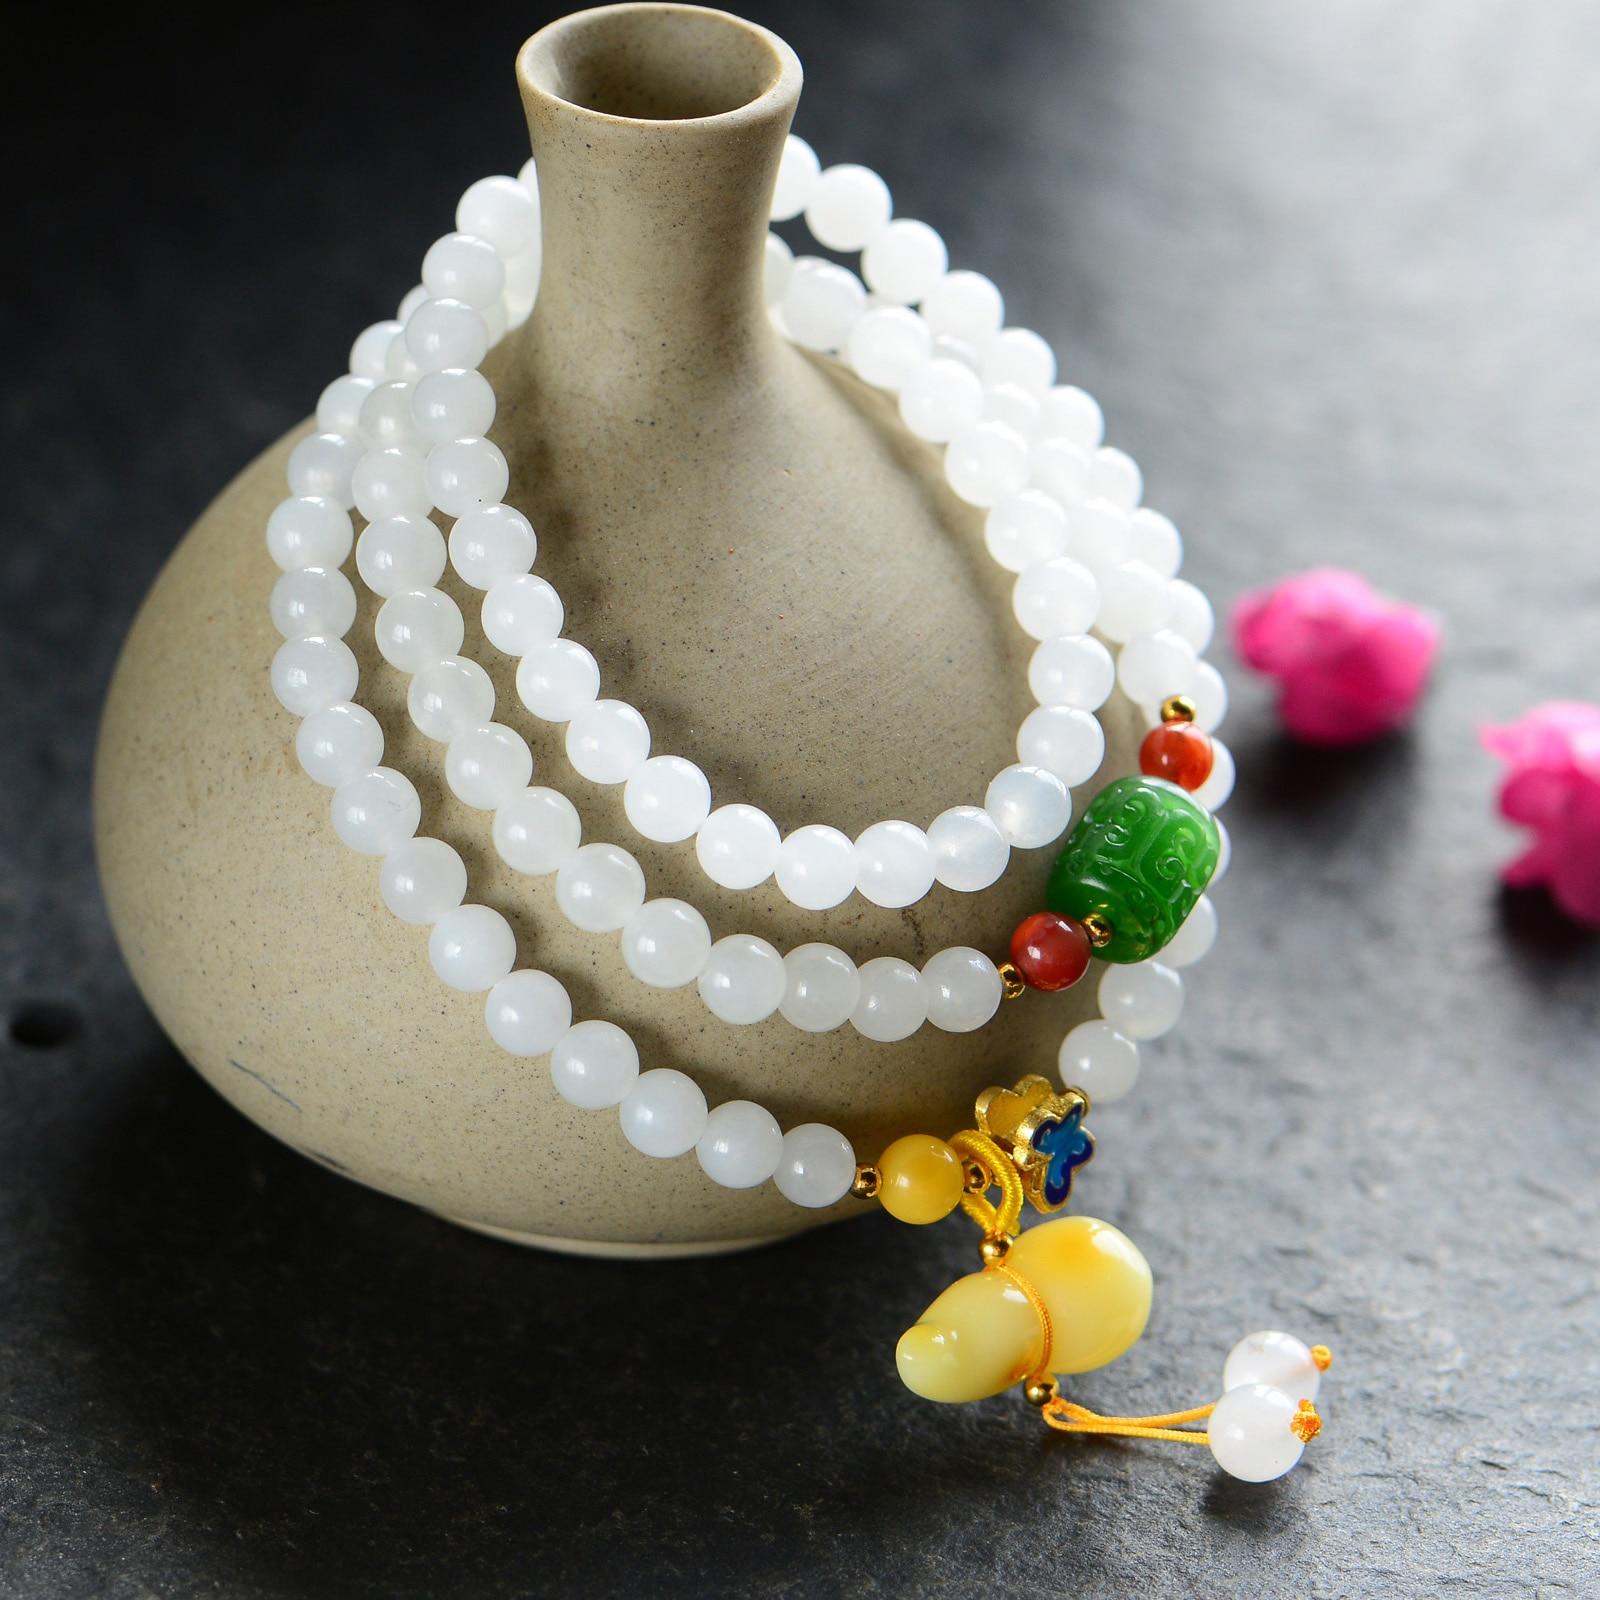 Handmade Authentic Hetian Bracelets 6mm handmade authentic hetian crystal budda bracelets